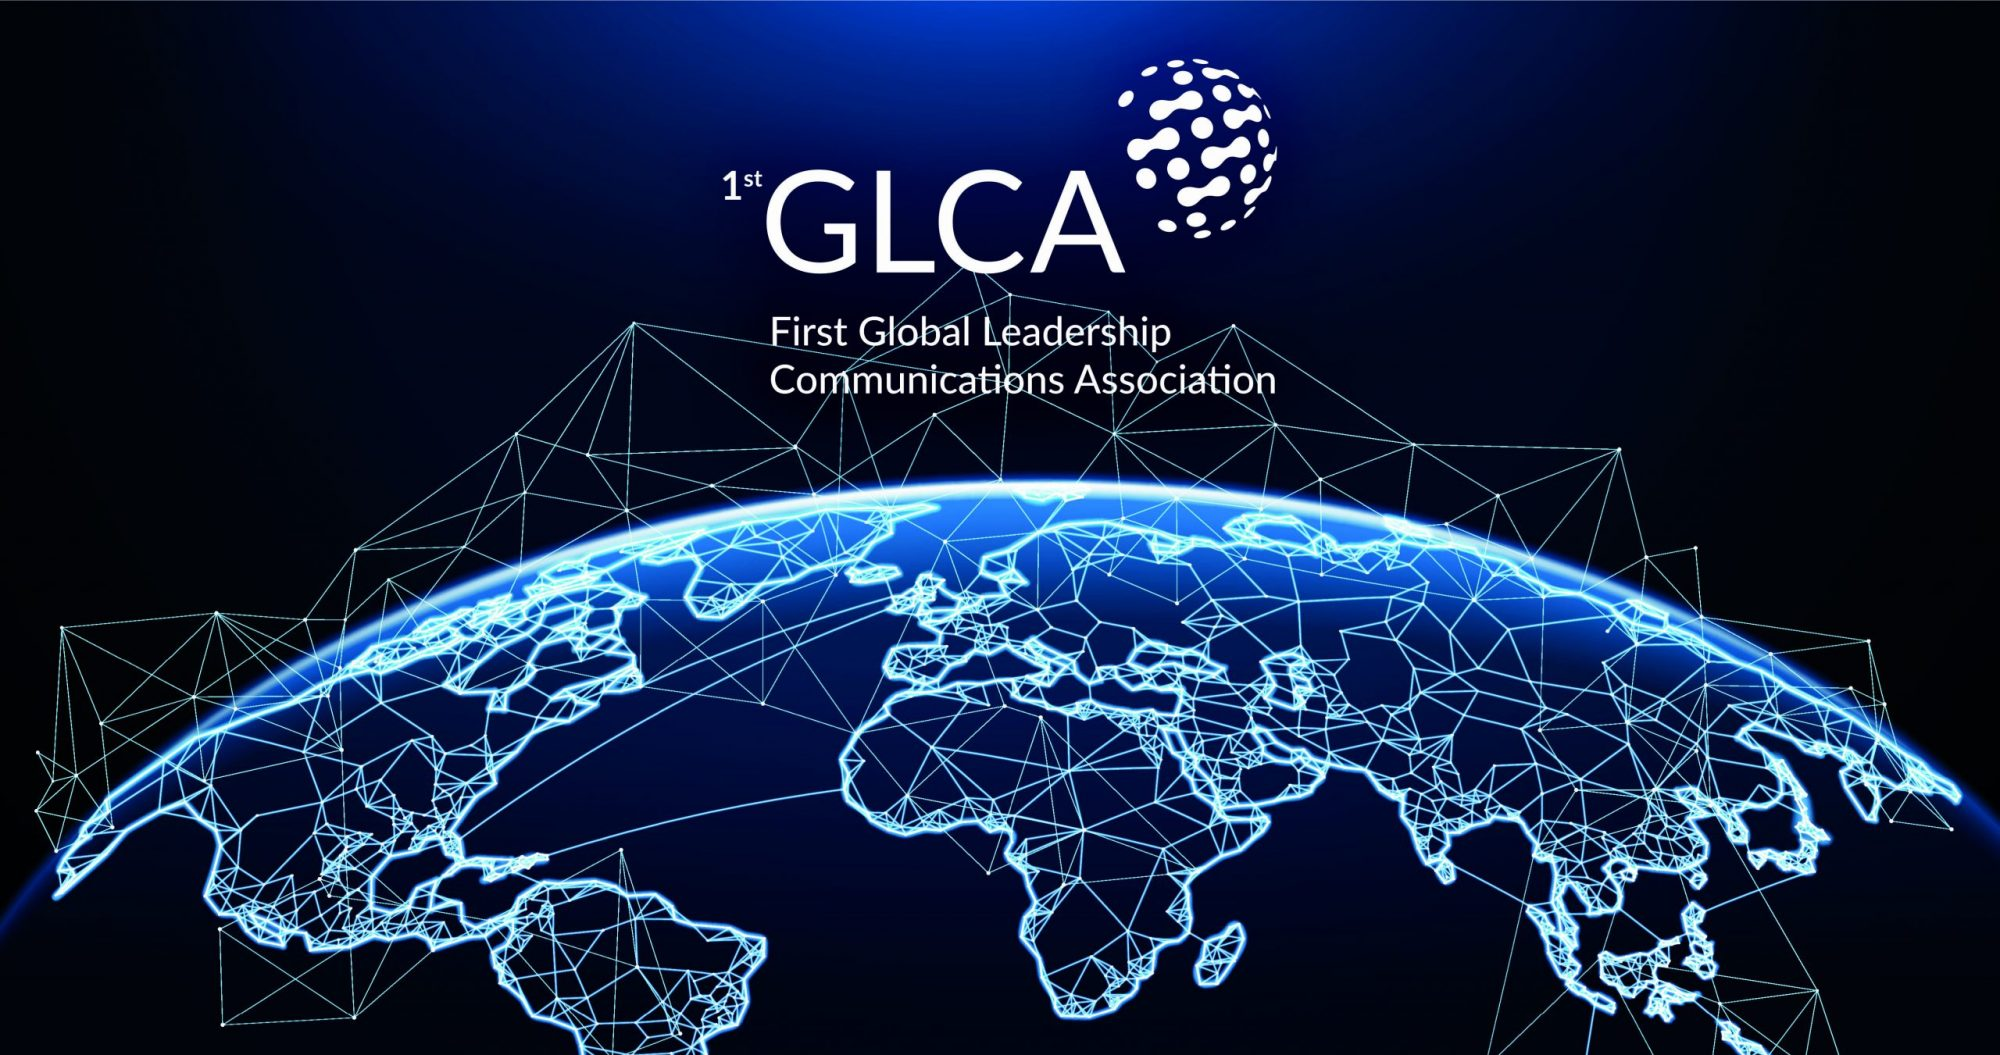 1st Global Leadership Communications Association